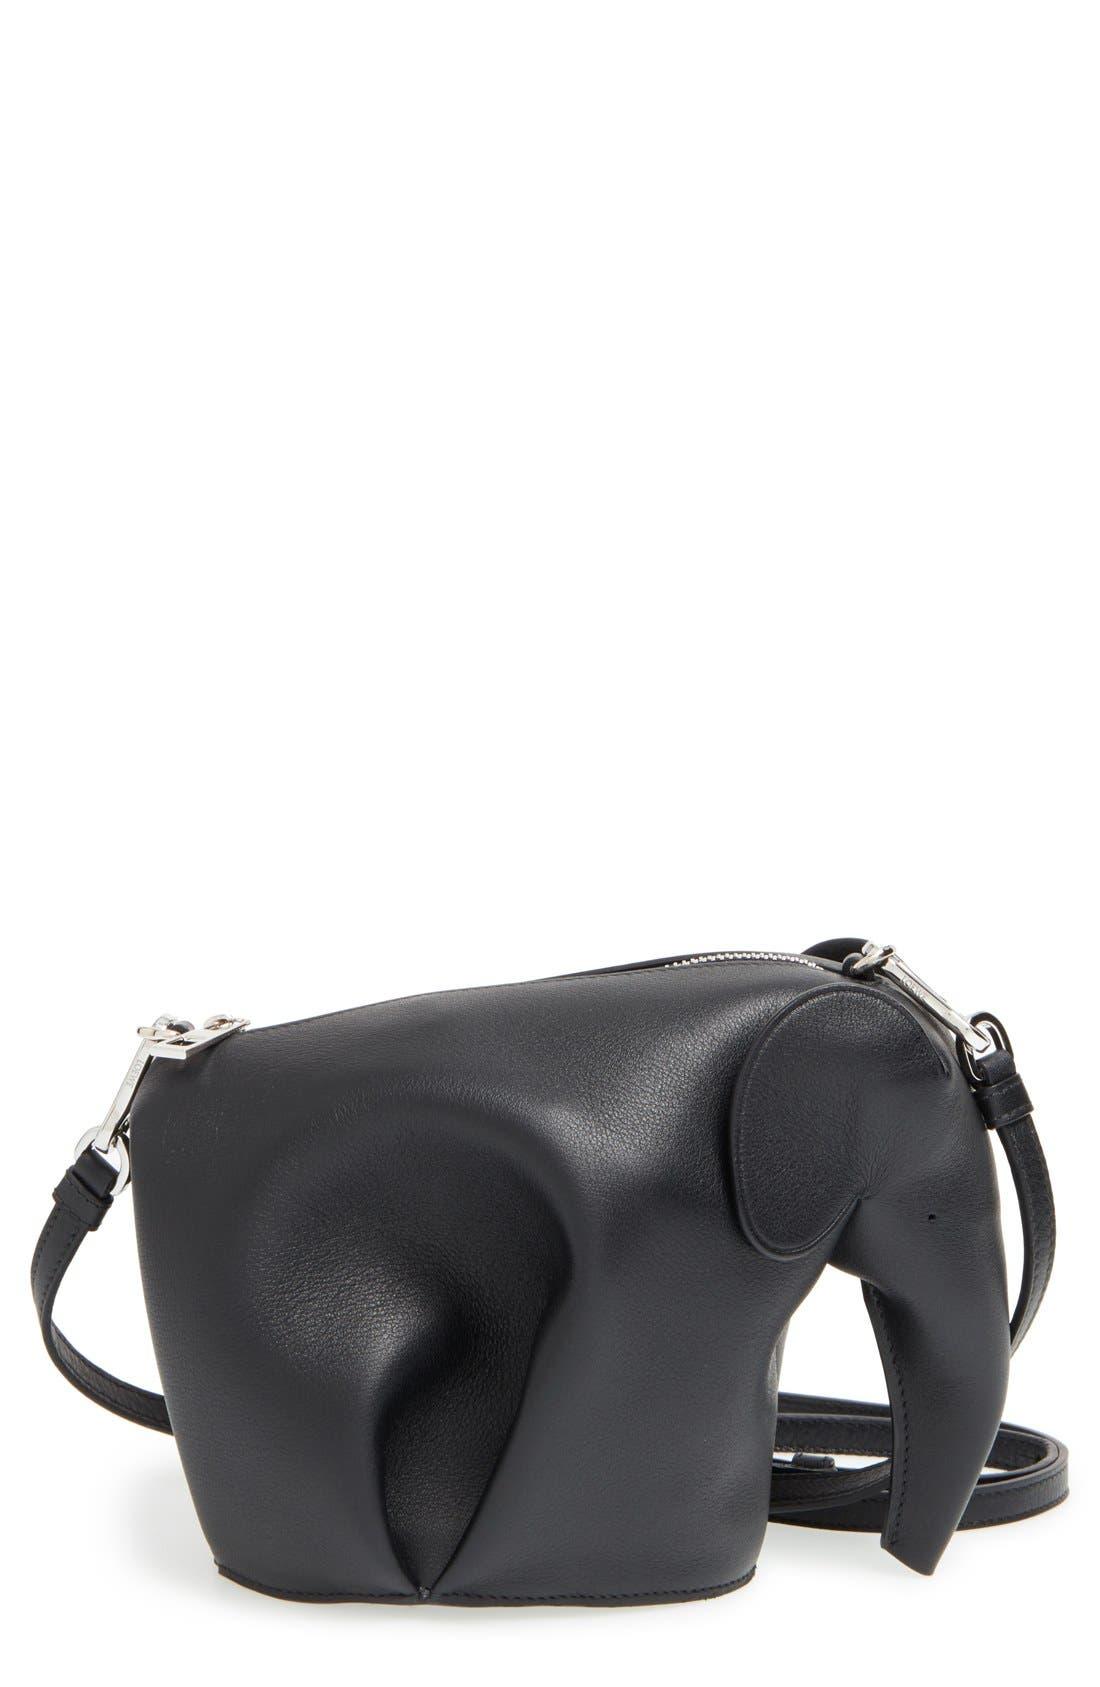 LOEWE, 'Mini Elephant' Crossbody Bag, Main thumbnail 1, color, 001